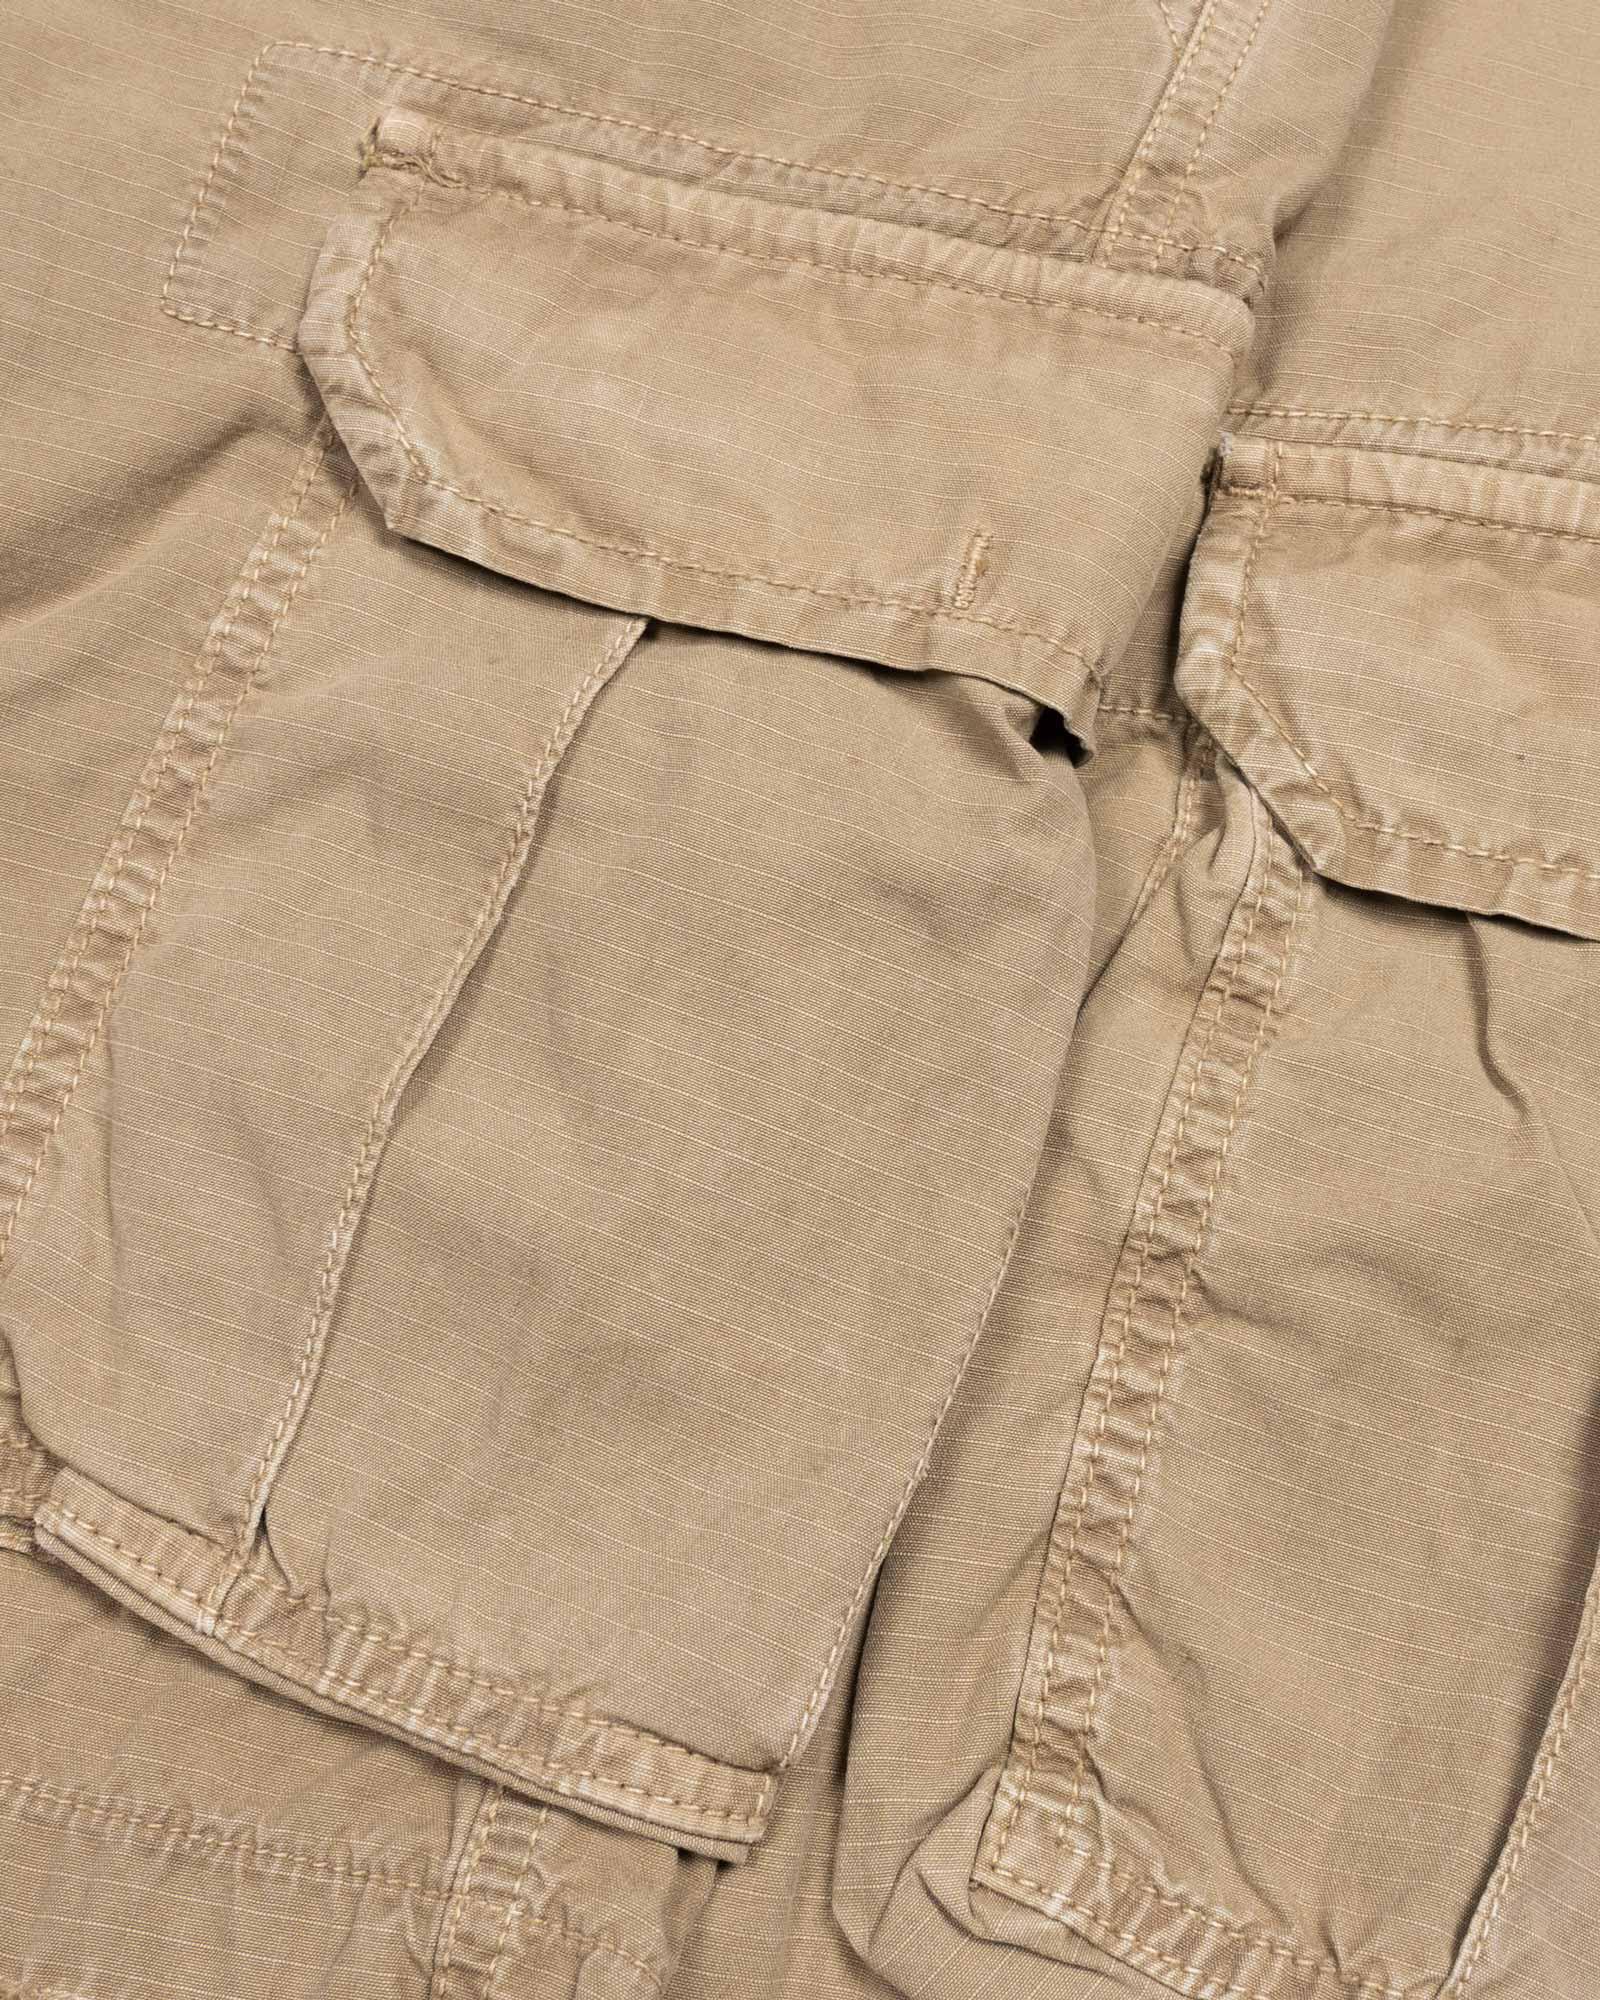 Мужские шорты карго Chesapeake's BARRAS — CARGO SHORT PANT